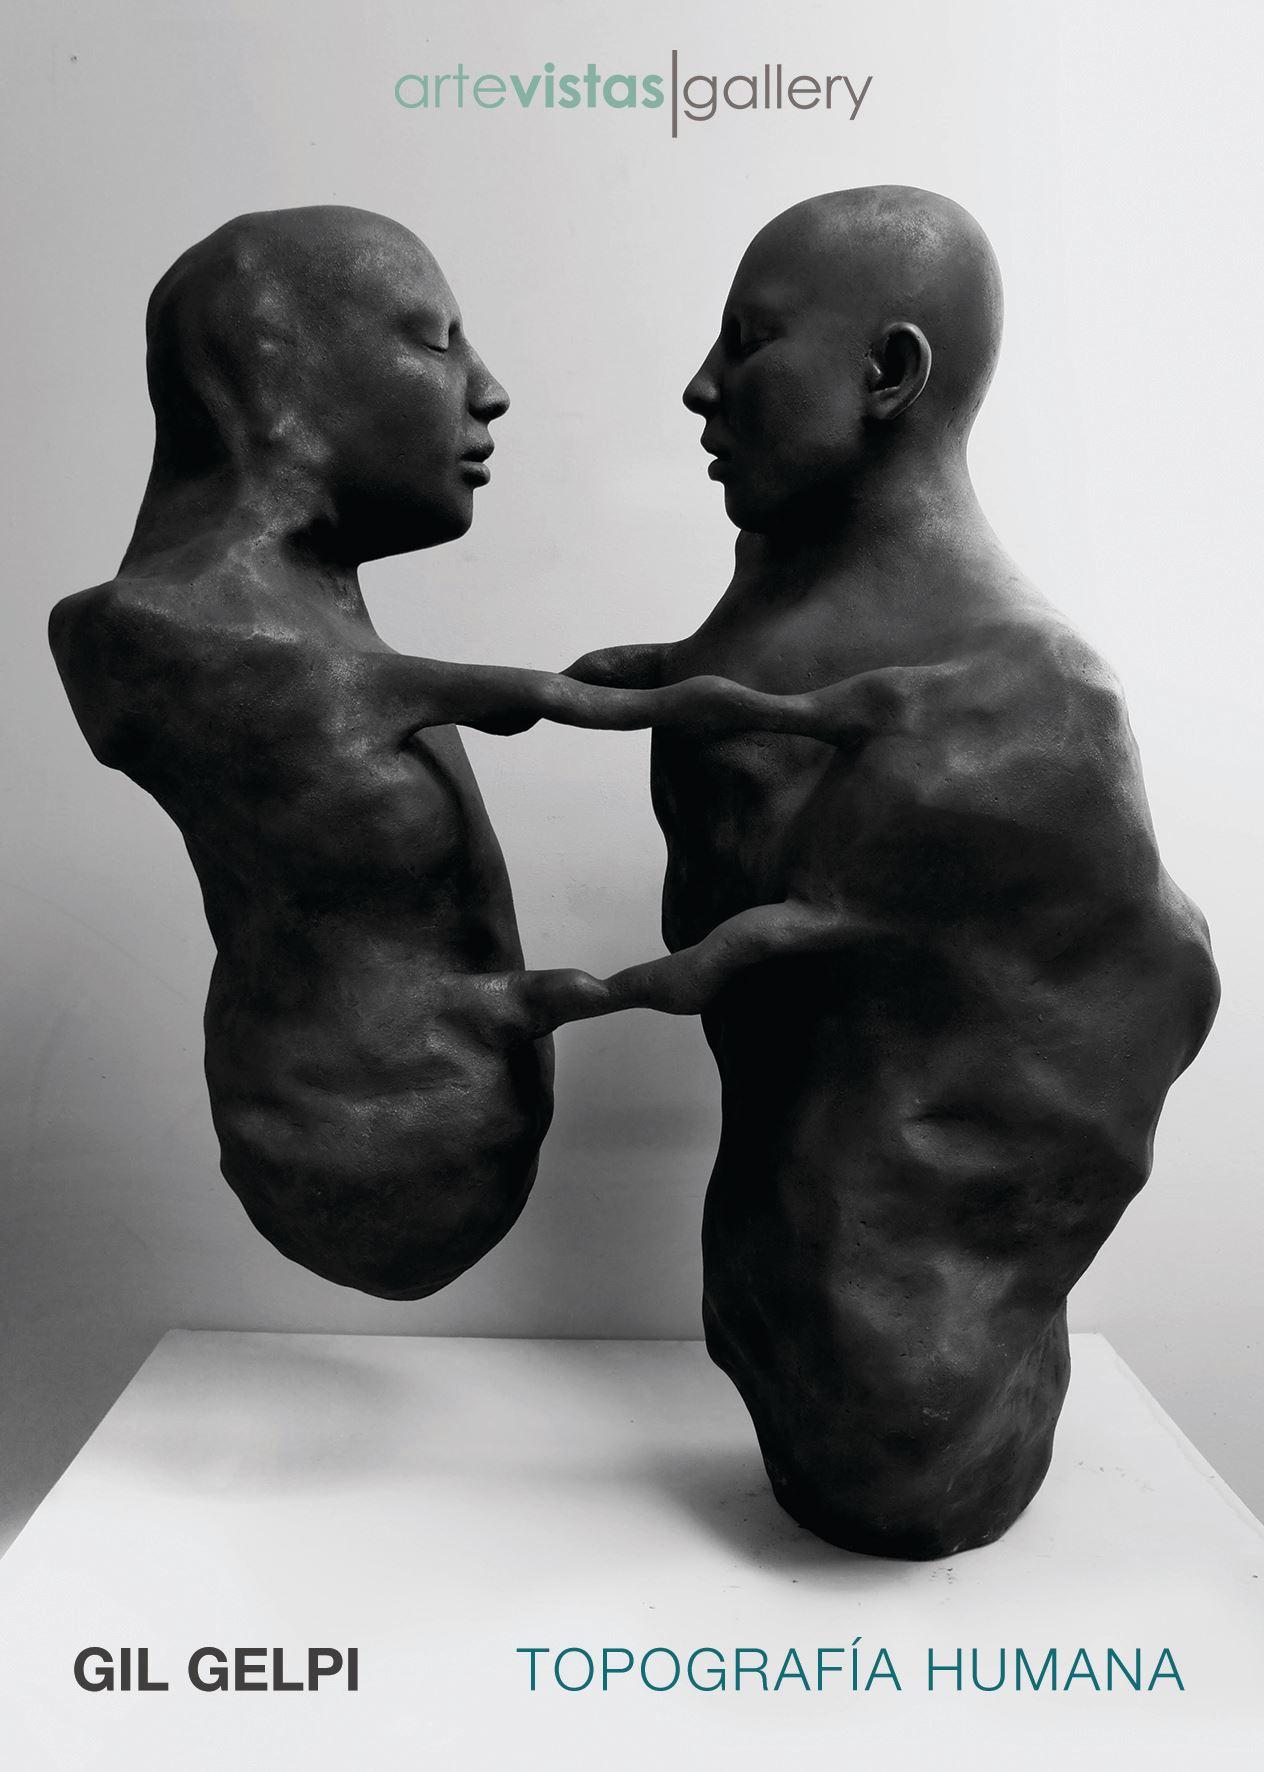 Topografía humana - Gil Gelpi